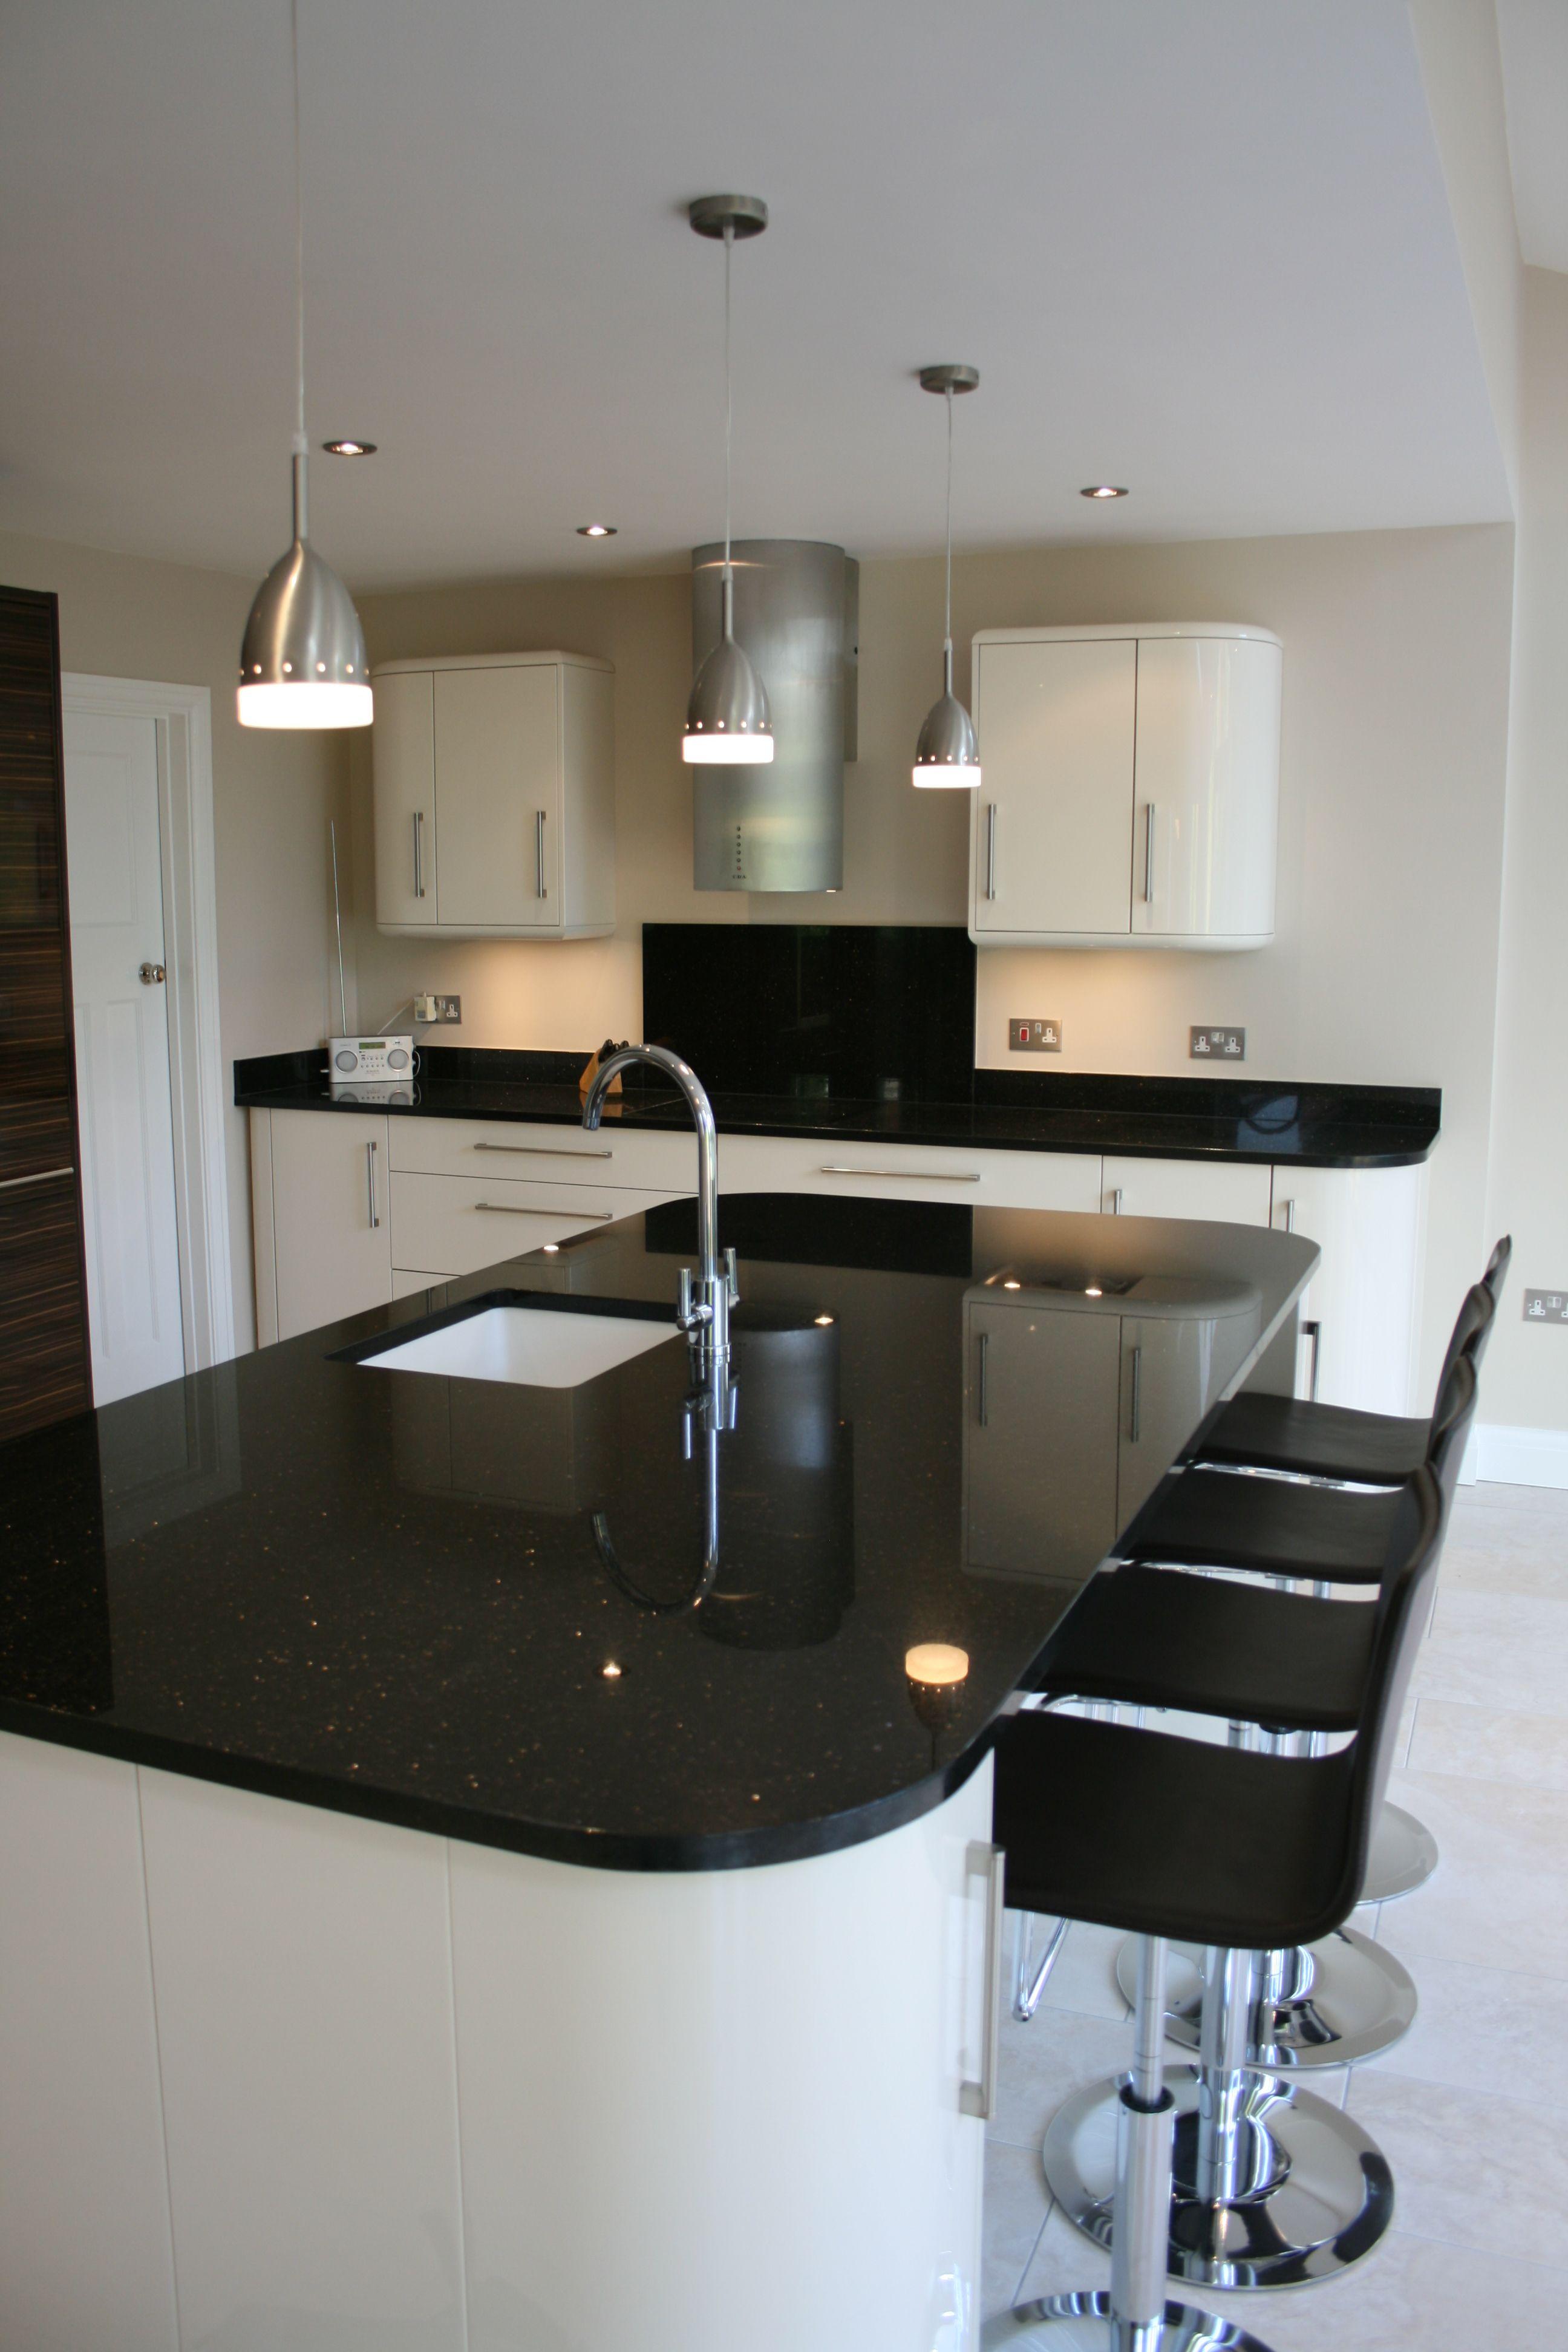 Contemporary Kitchen Island Incorporating Wine Fridge Storage Cupboards Undermount Sink And Bar Seating